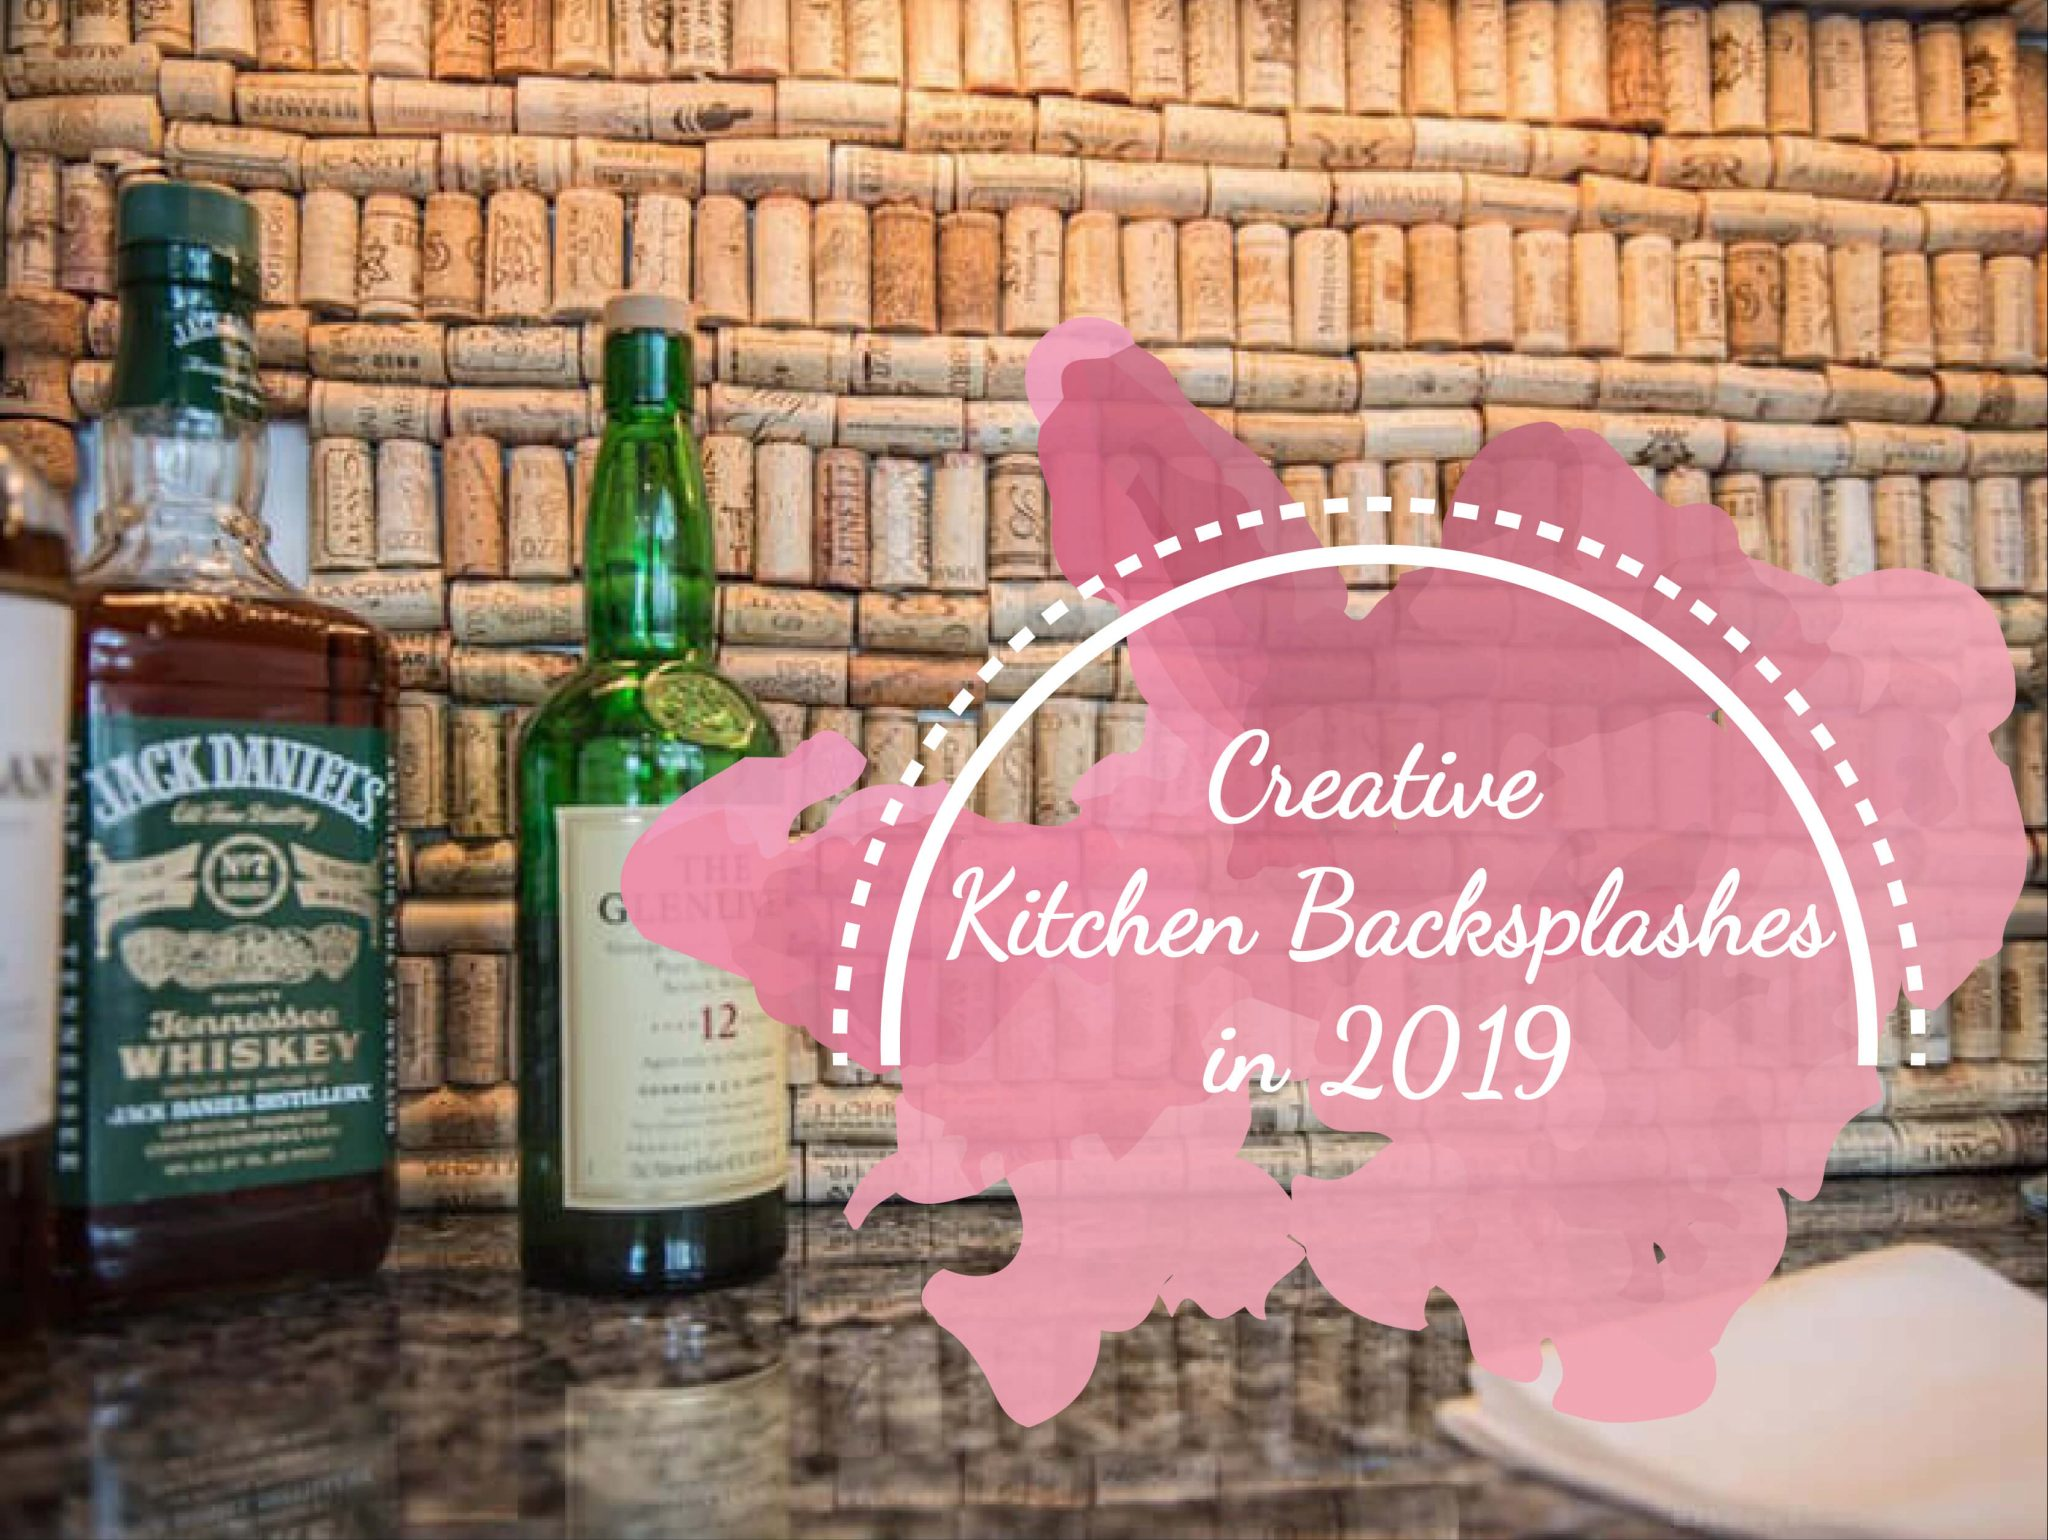 - Creative Kitchen Backsplashes In 2019 - My Ideal Home